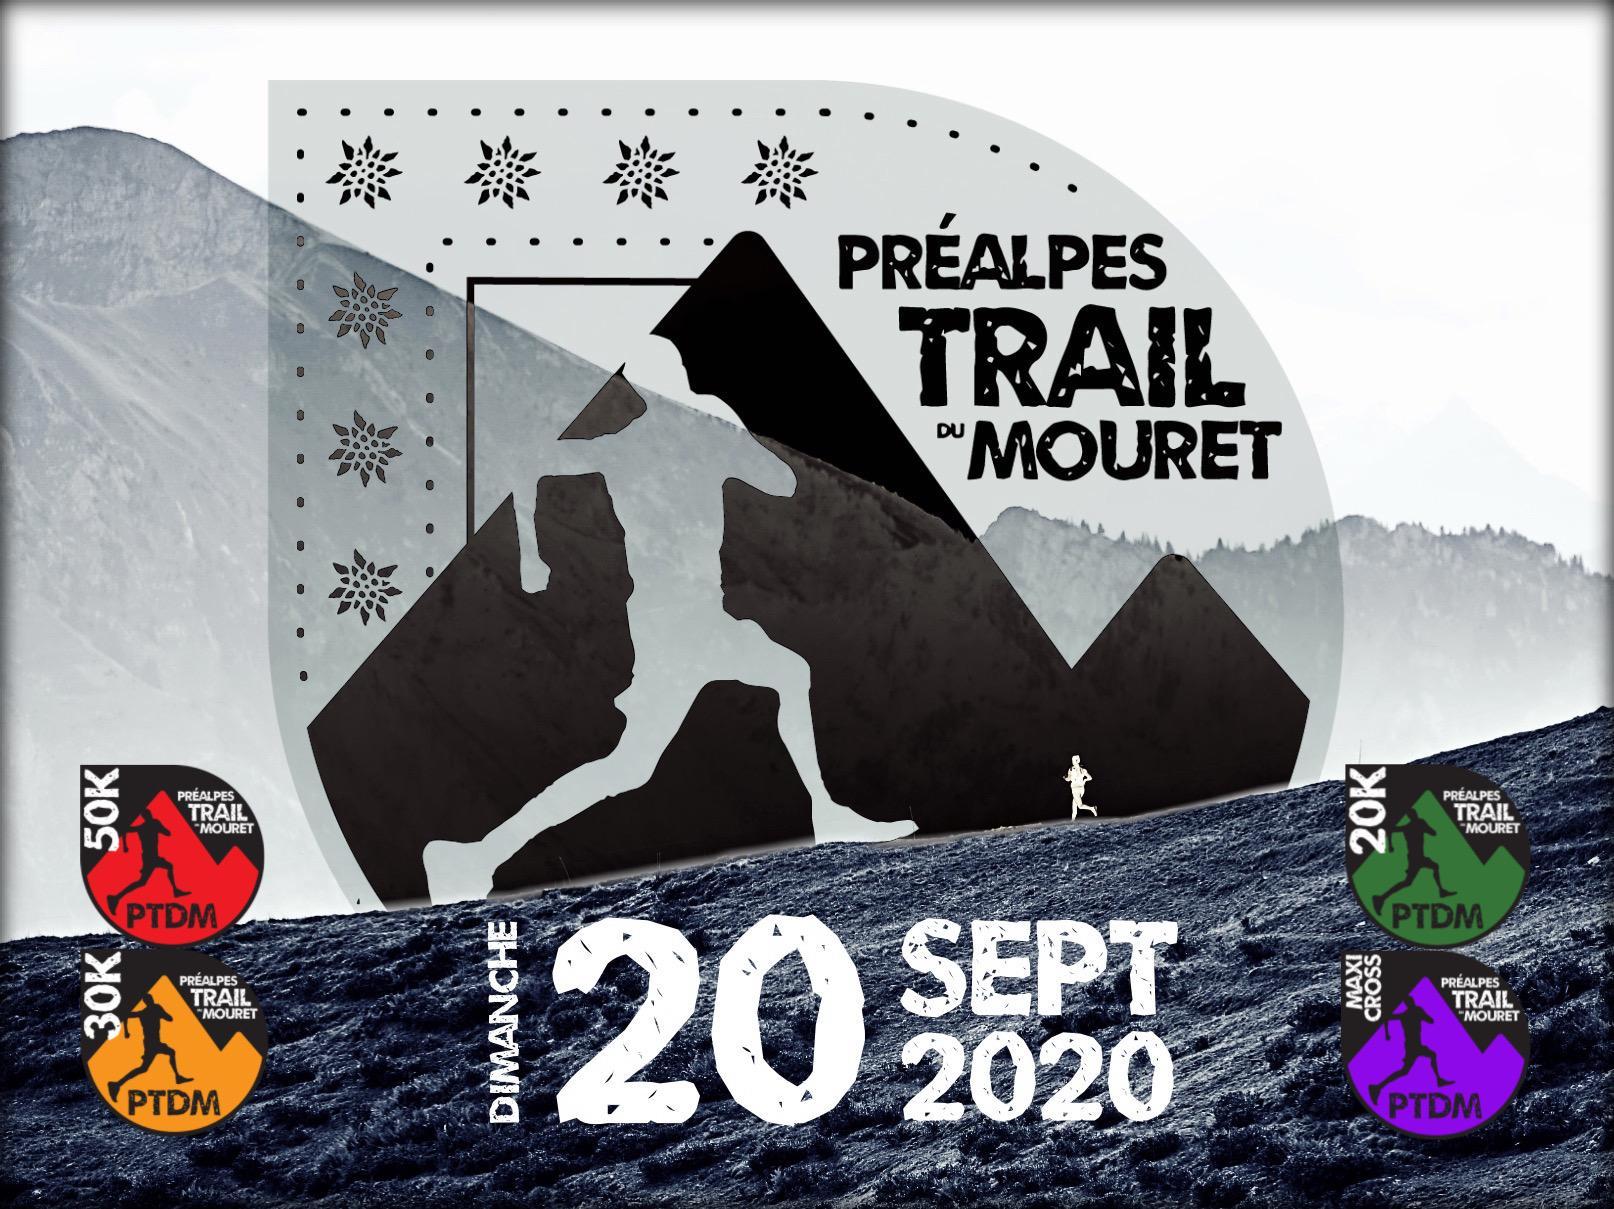 Media: Image_courses/2020/Visuel-Mouret_1.jpeg